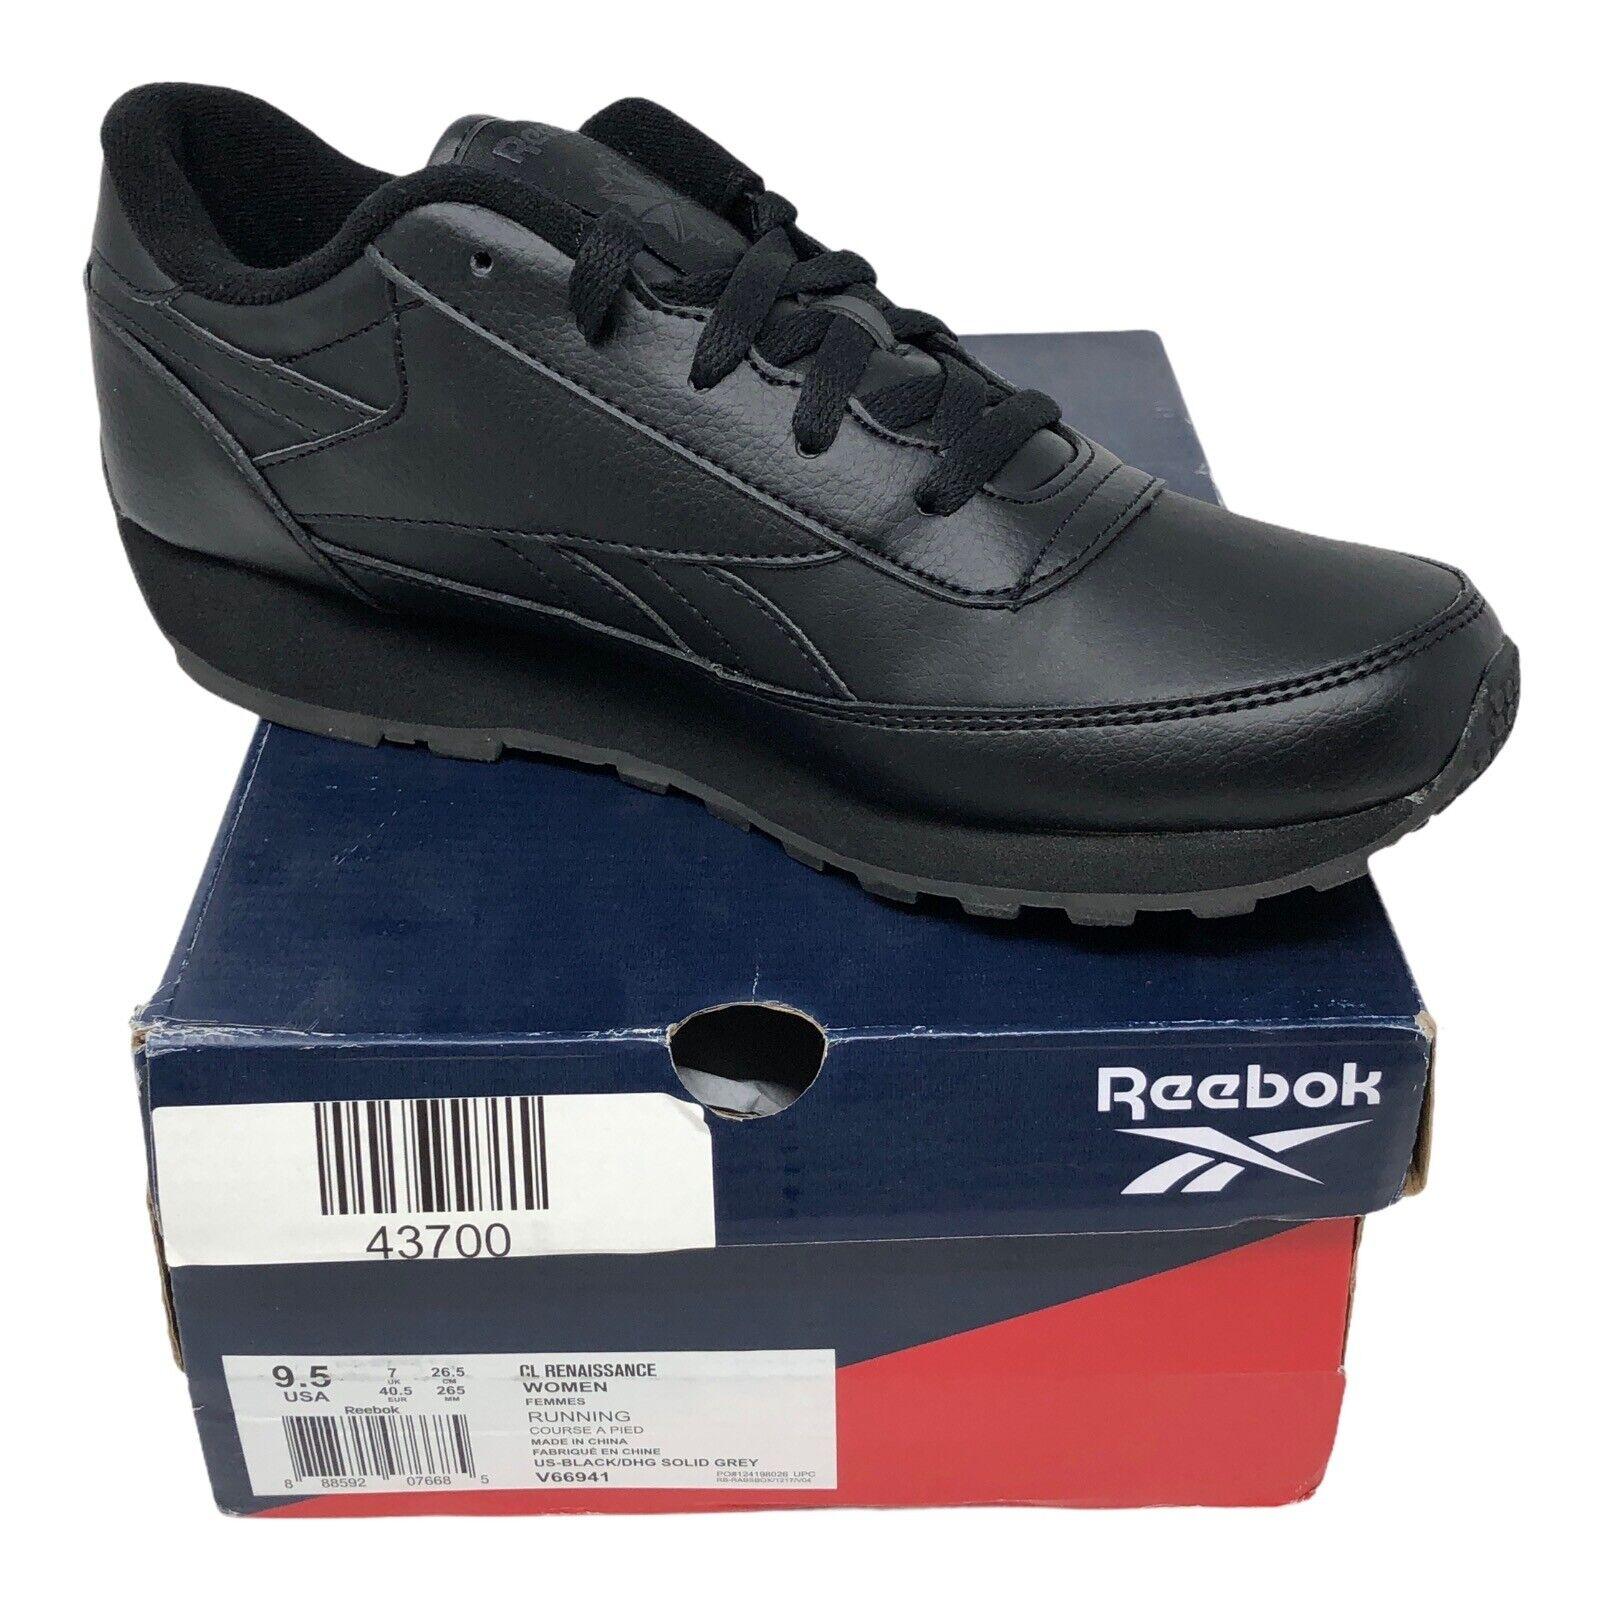 Reebok Women's Renaissance Running Shoe Black Size 9.5